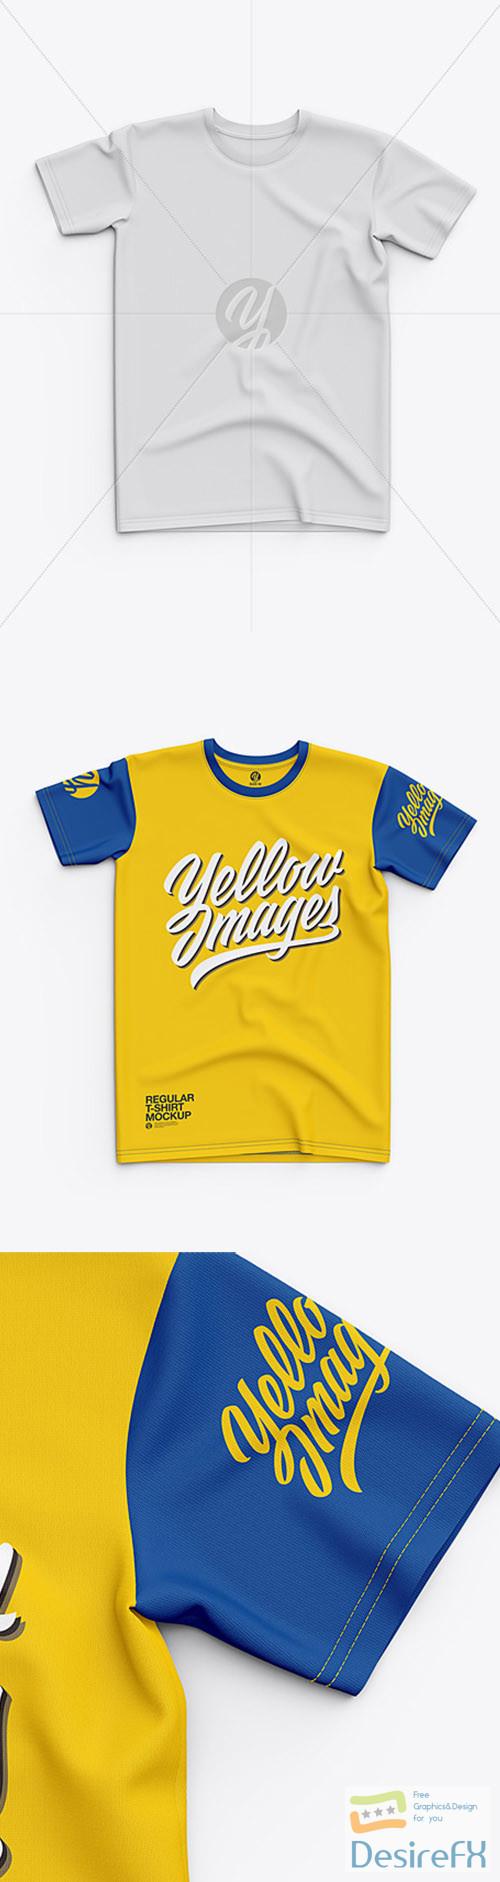 Mens Classic Regular T-Shirt - Top View 30237 TIF